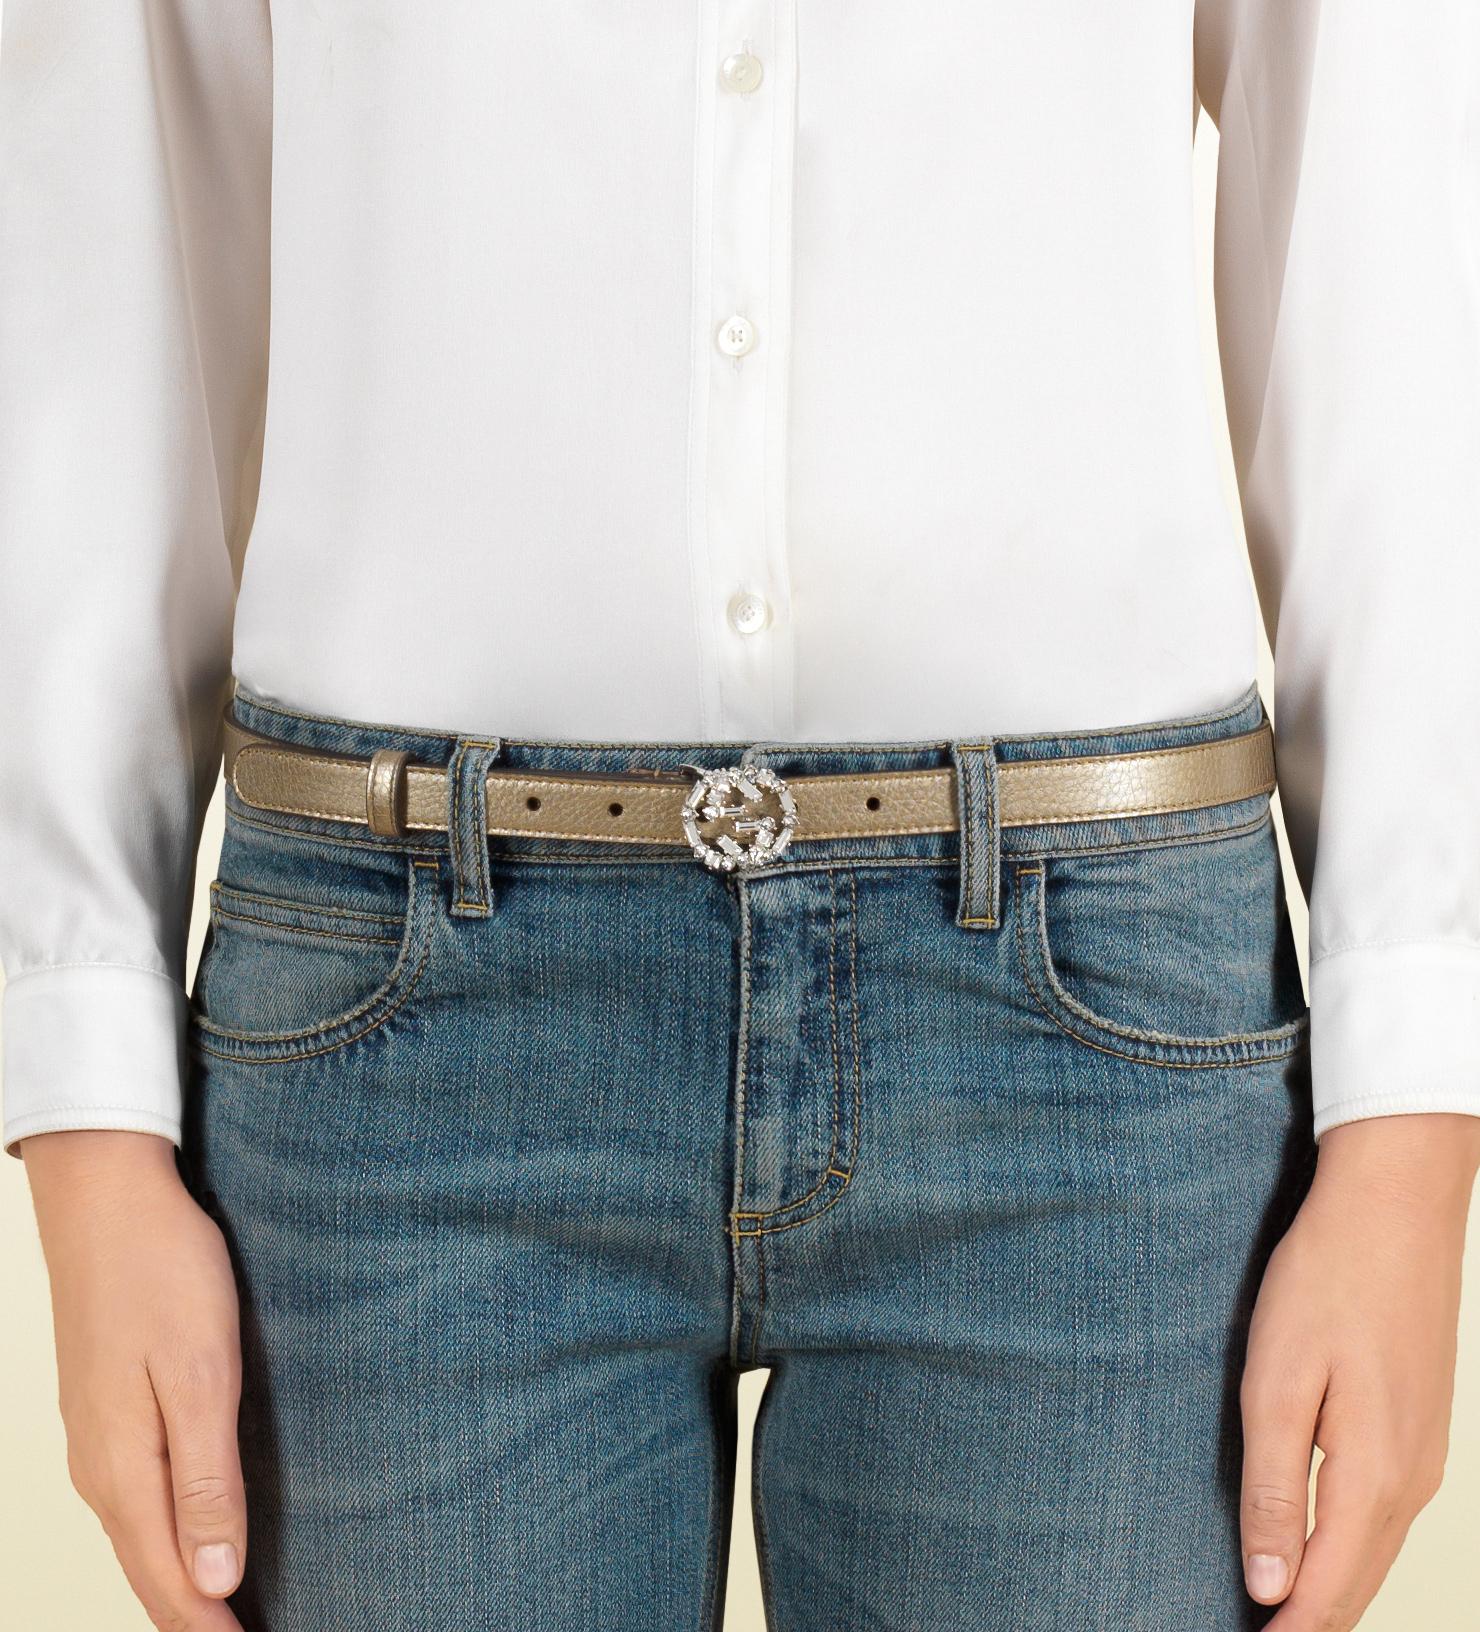 c3b90573d2a6 Lyst - Gucci Metallic Leather Belt With Crystal Interlocking G ...